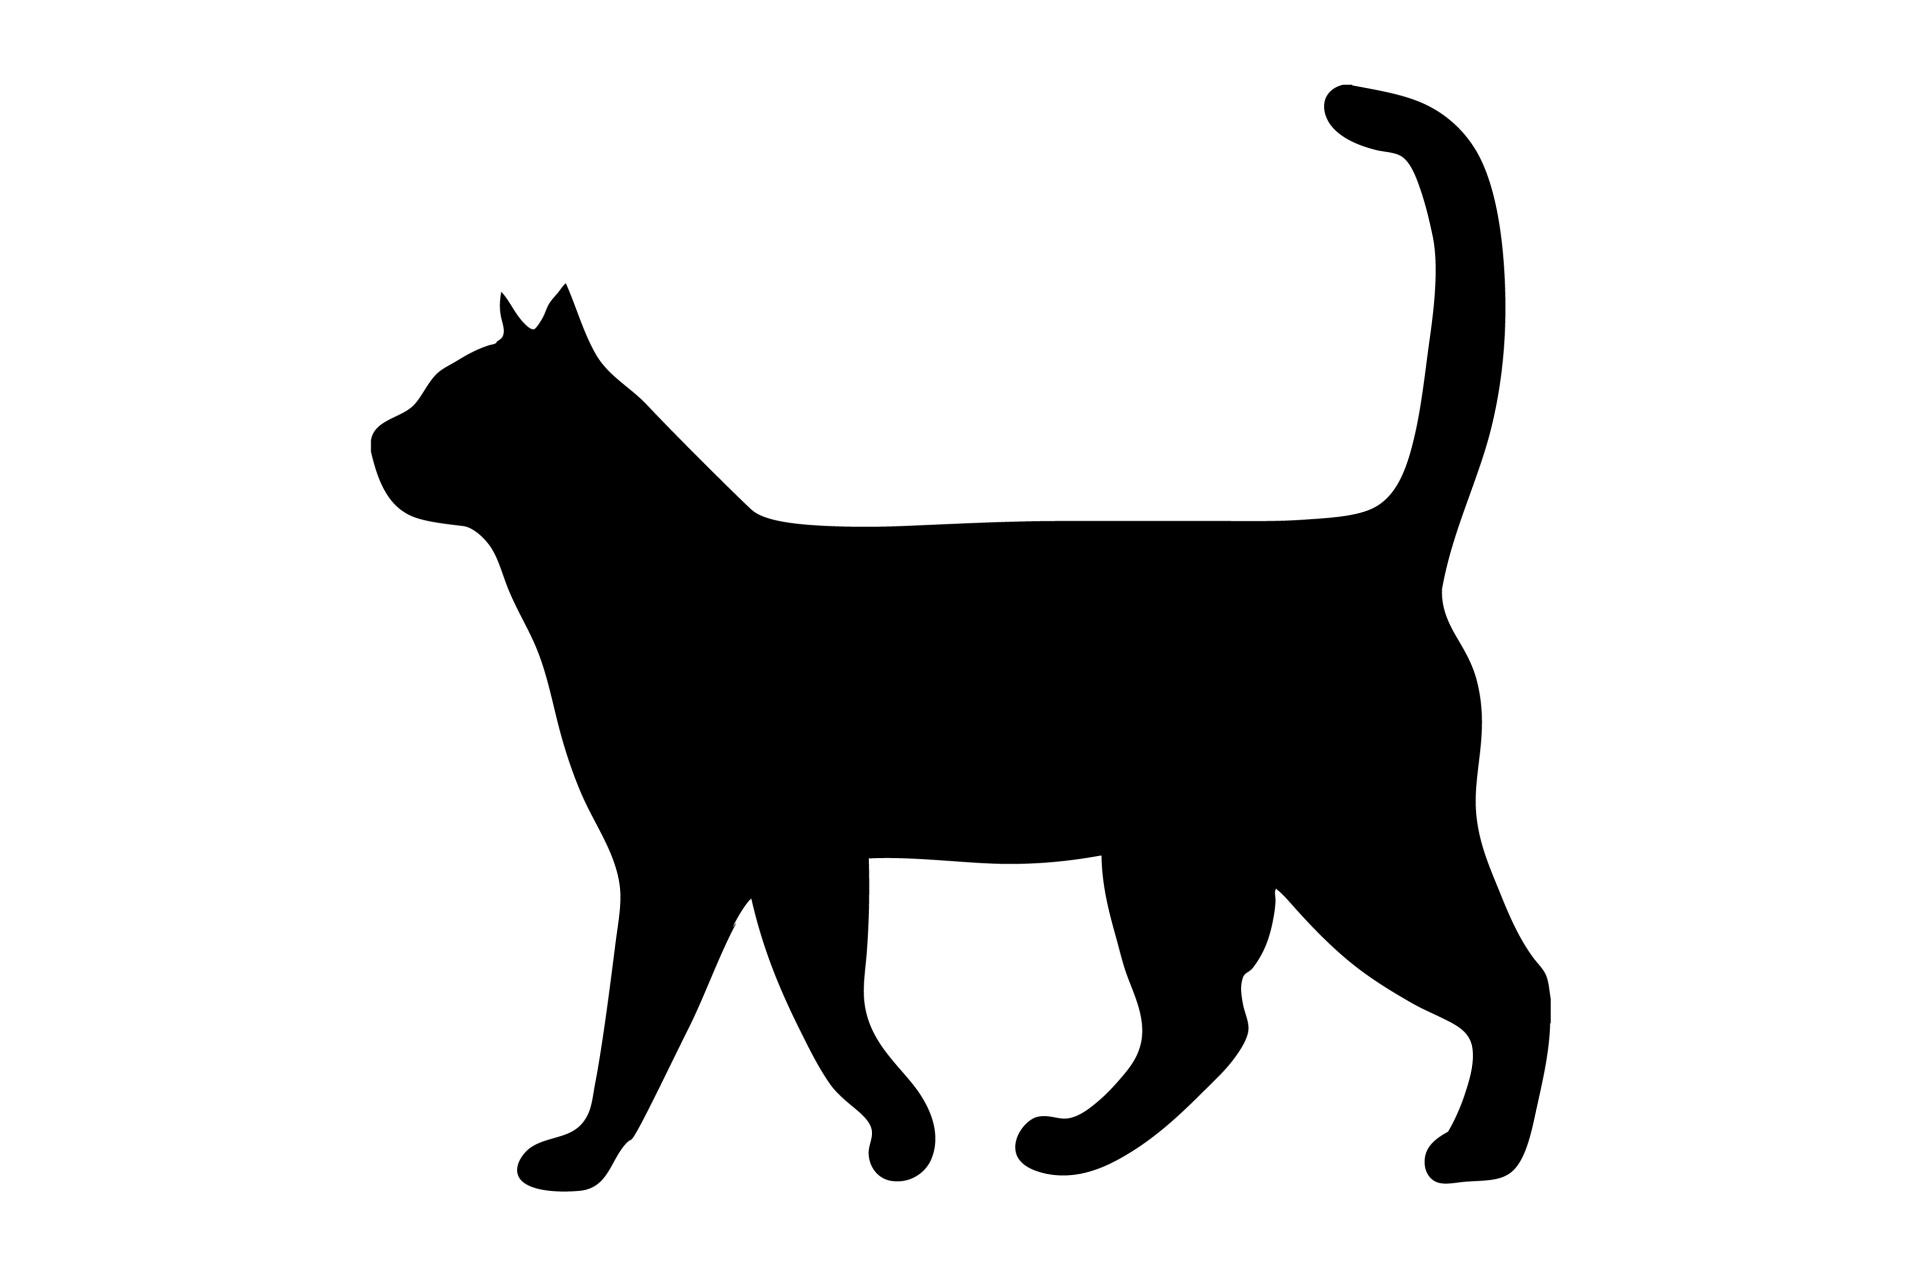 1920x1280 Walking Cat Clipart Amp Walking Cat Clip Art Images